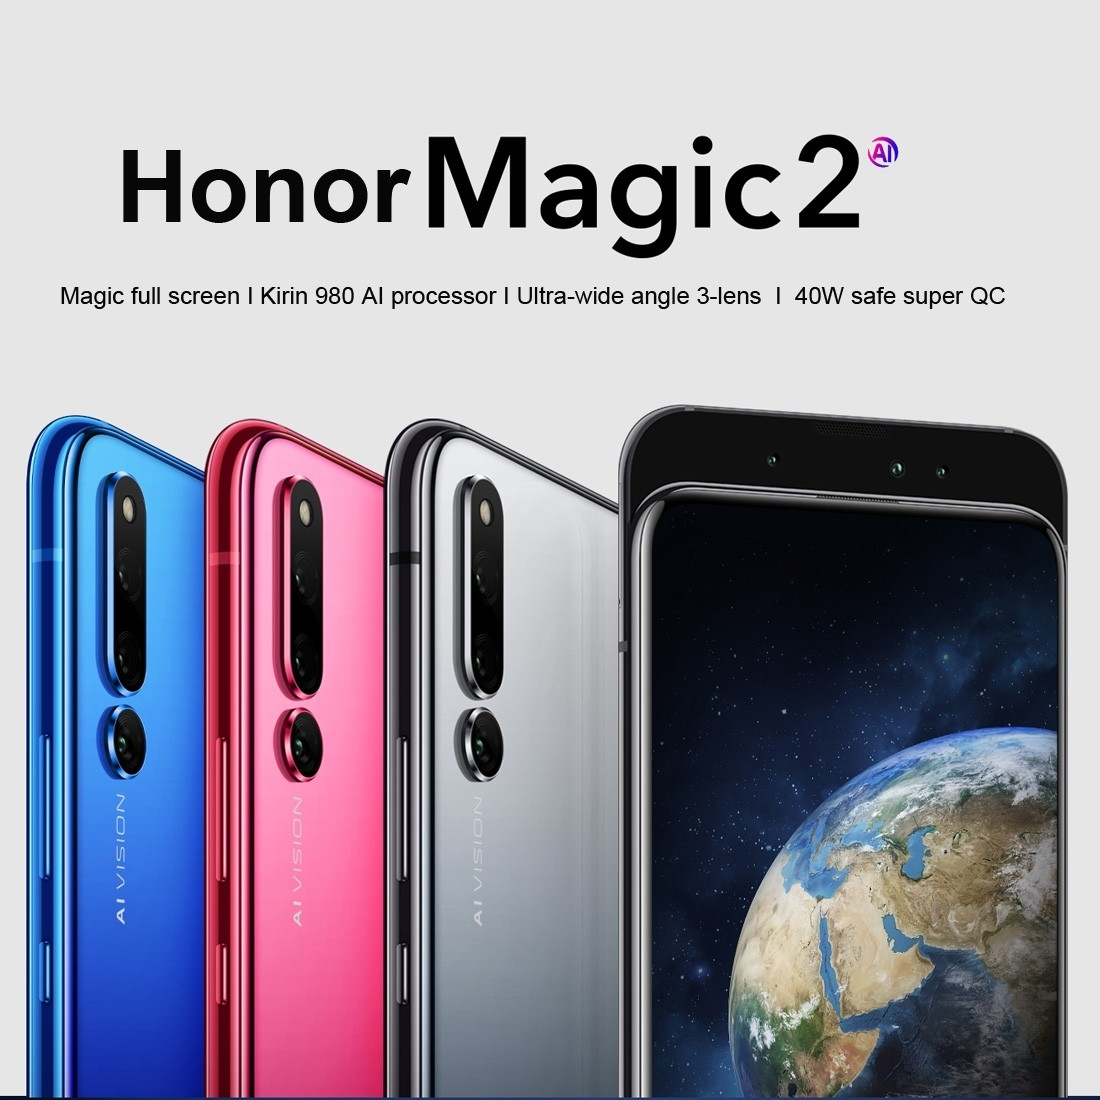 Price of Huawei Honor Magic 2 in Nigeria